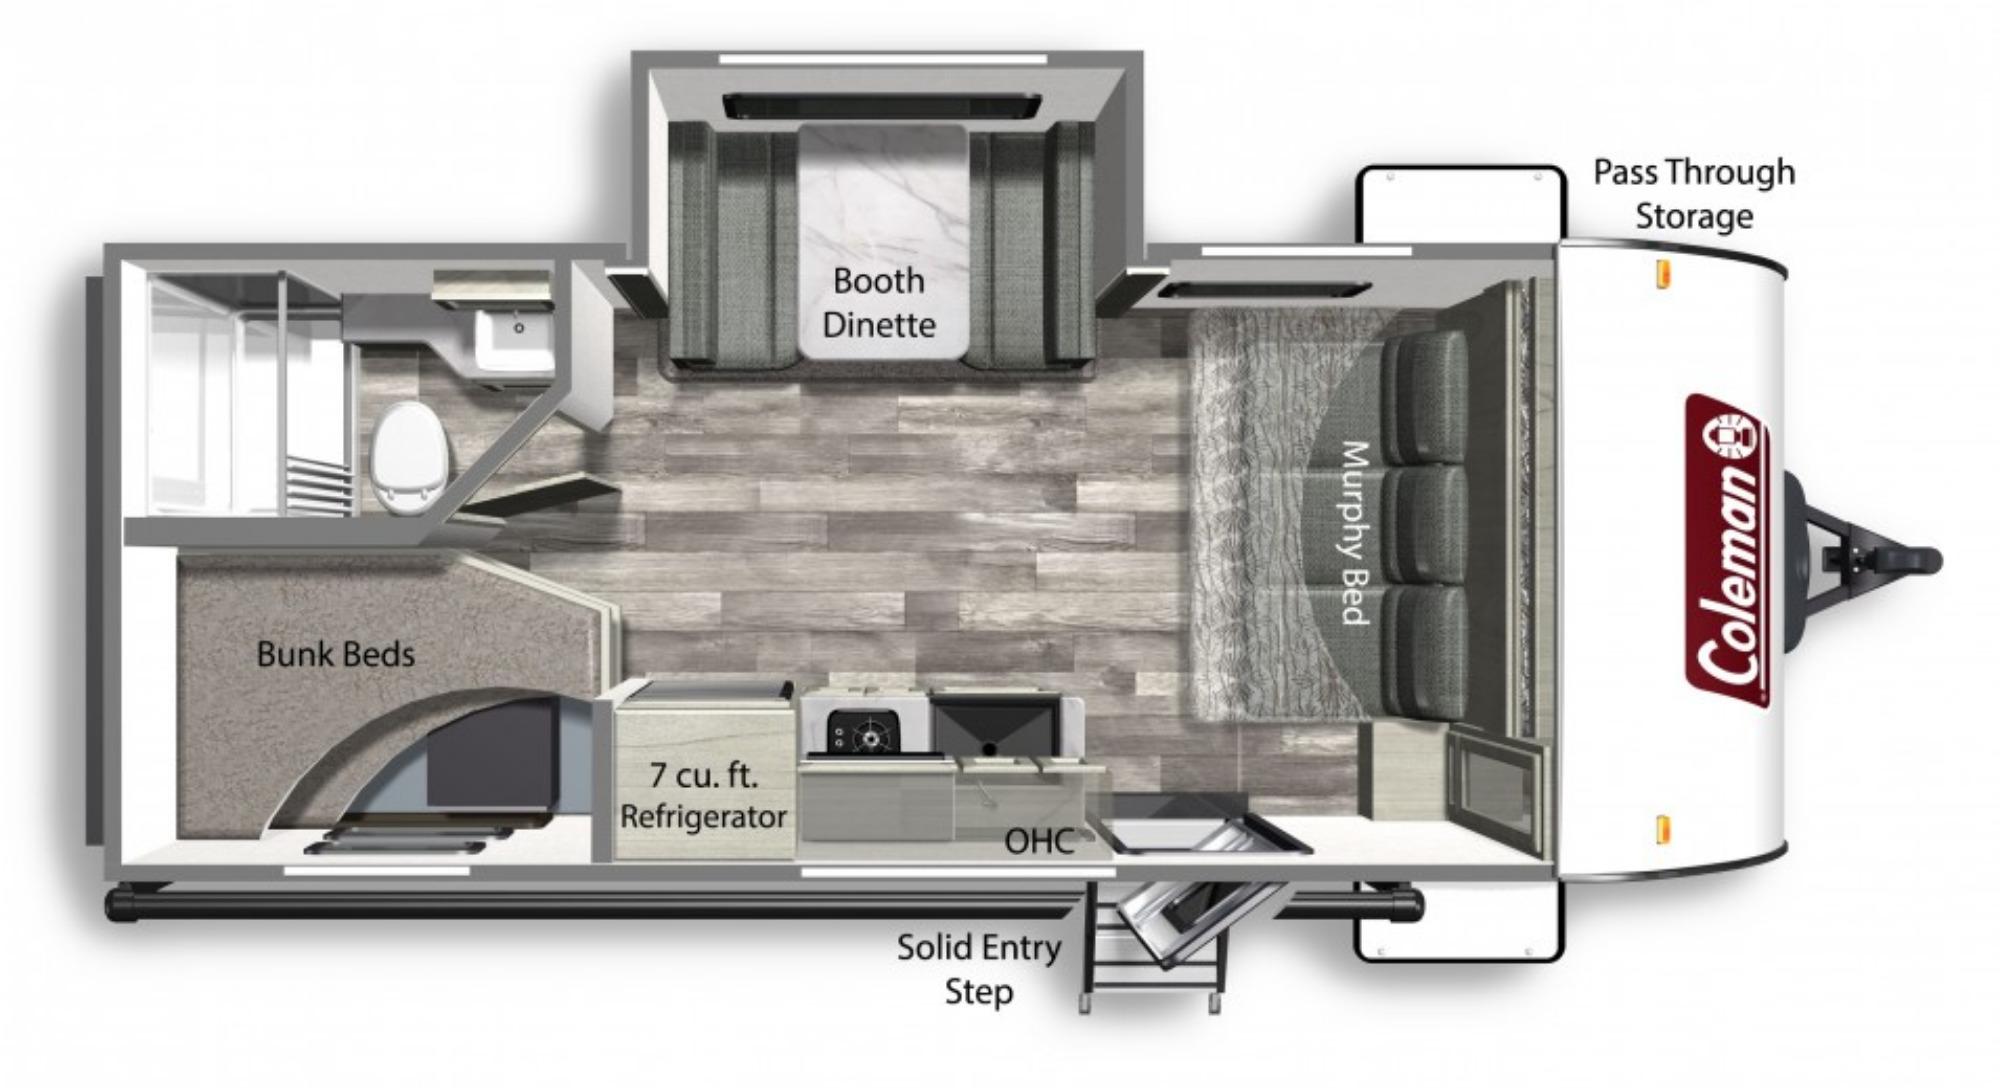 View Floor Plan for 2022 COLEMAN COLEMAN LIGHT 1905BH